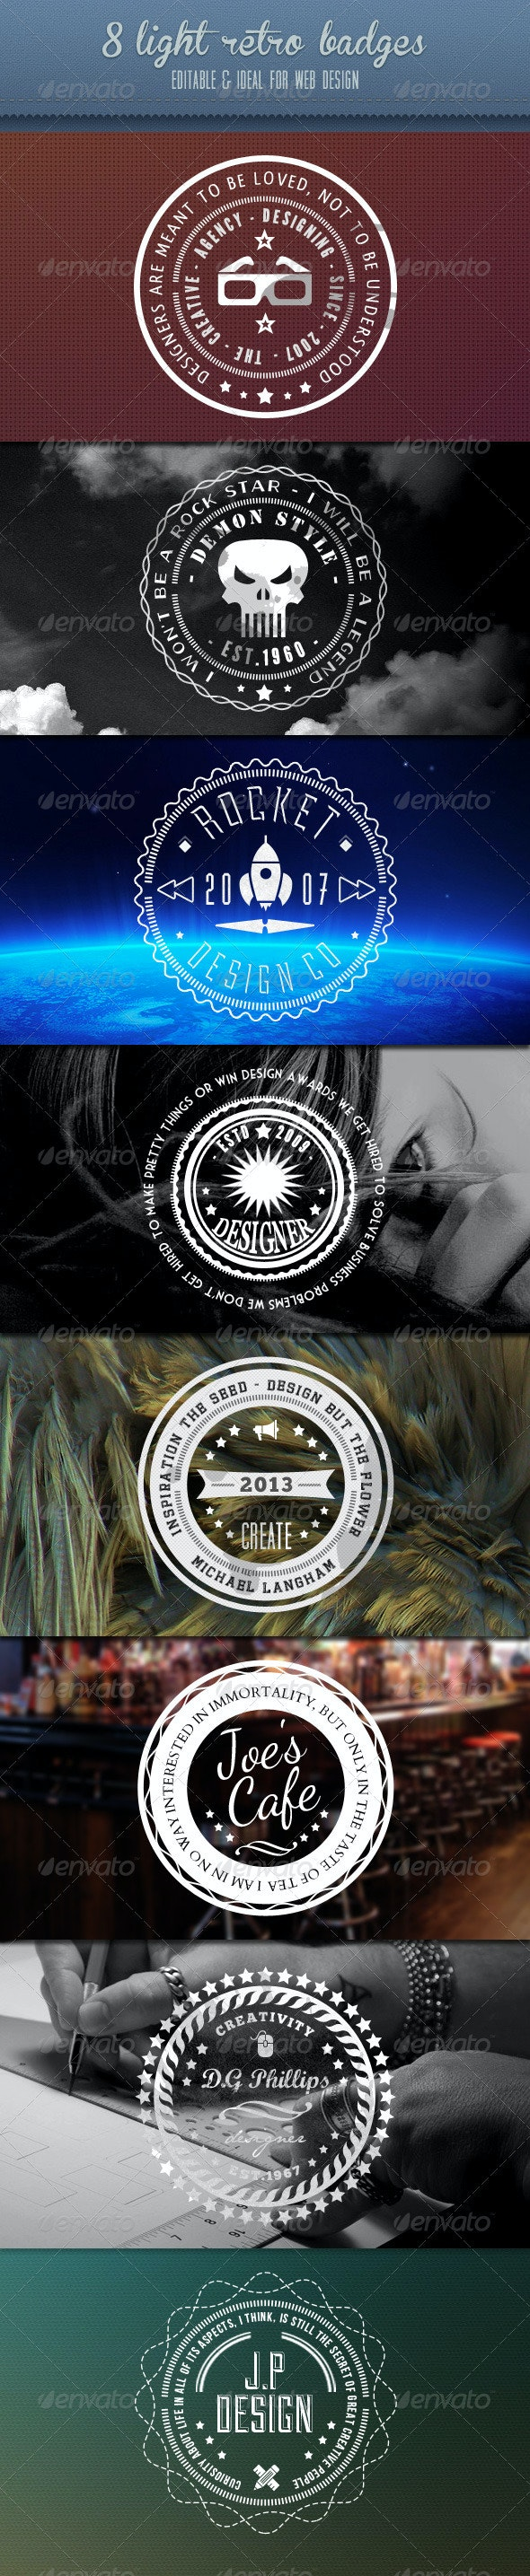 Retro Badges - Vintage White Set - Badges & Stickers Web Elements